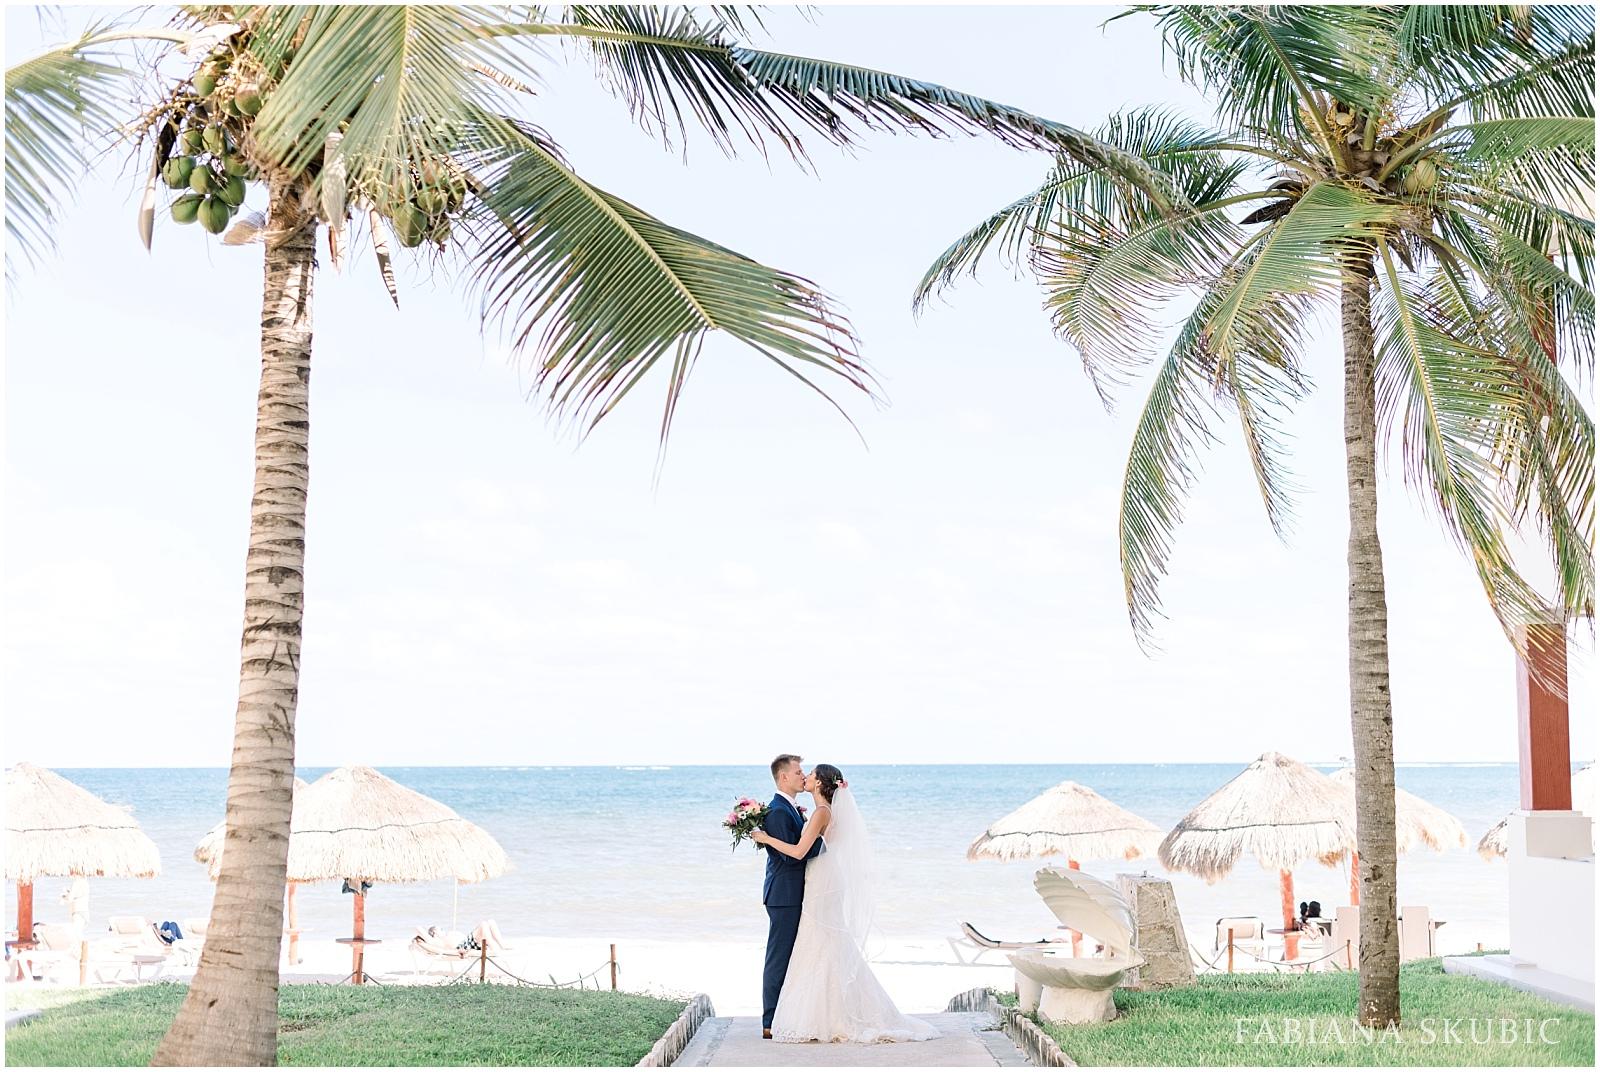 TJ_Now_Sapphire_Riviera_Cancun_Mexico_Wedding_Photos_0194.jpg